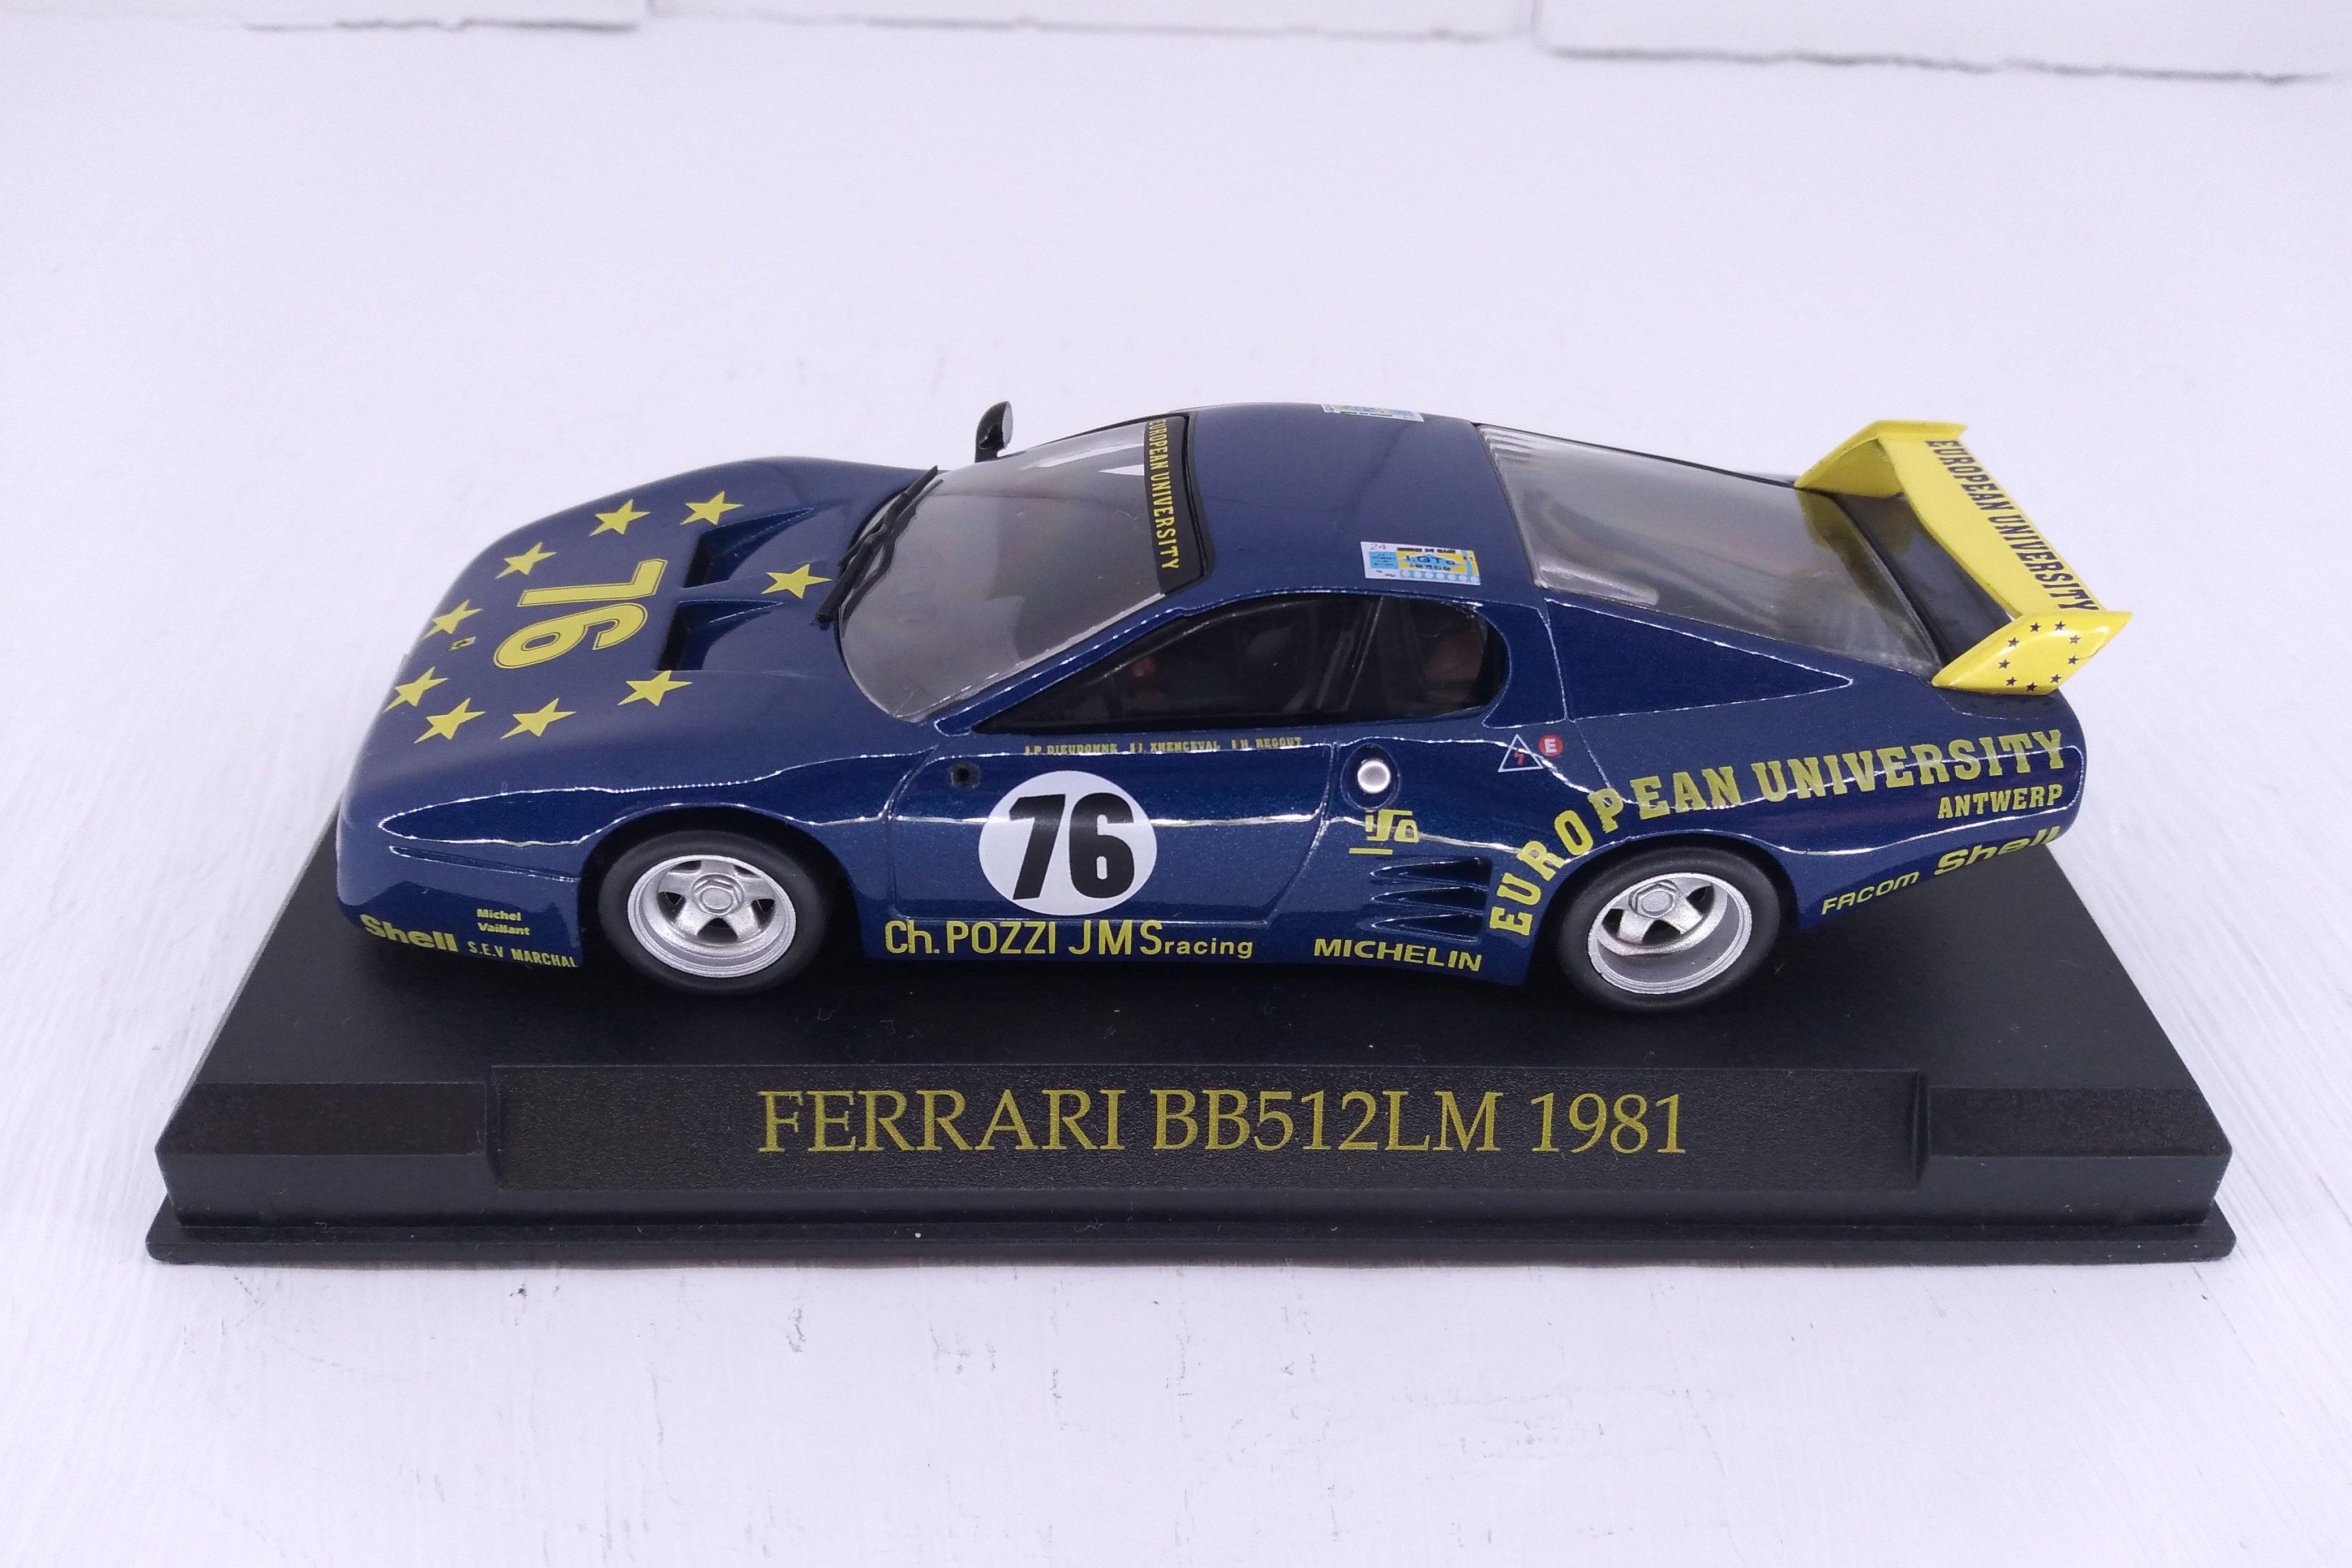 Collection of 80 Ferrari models